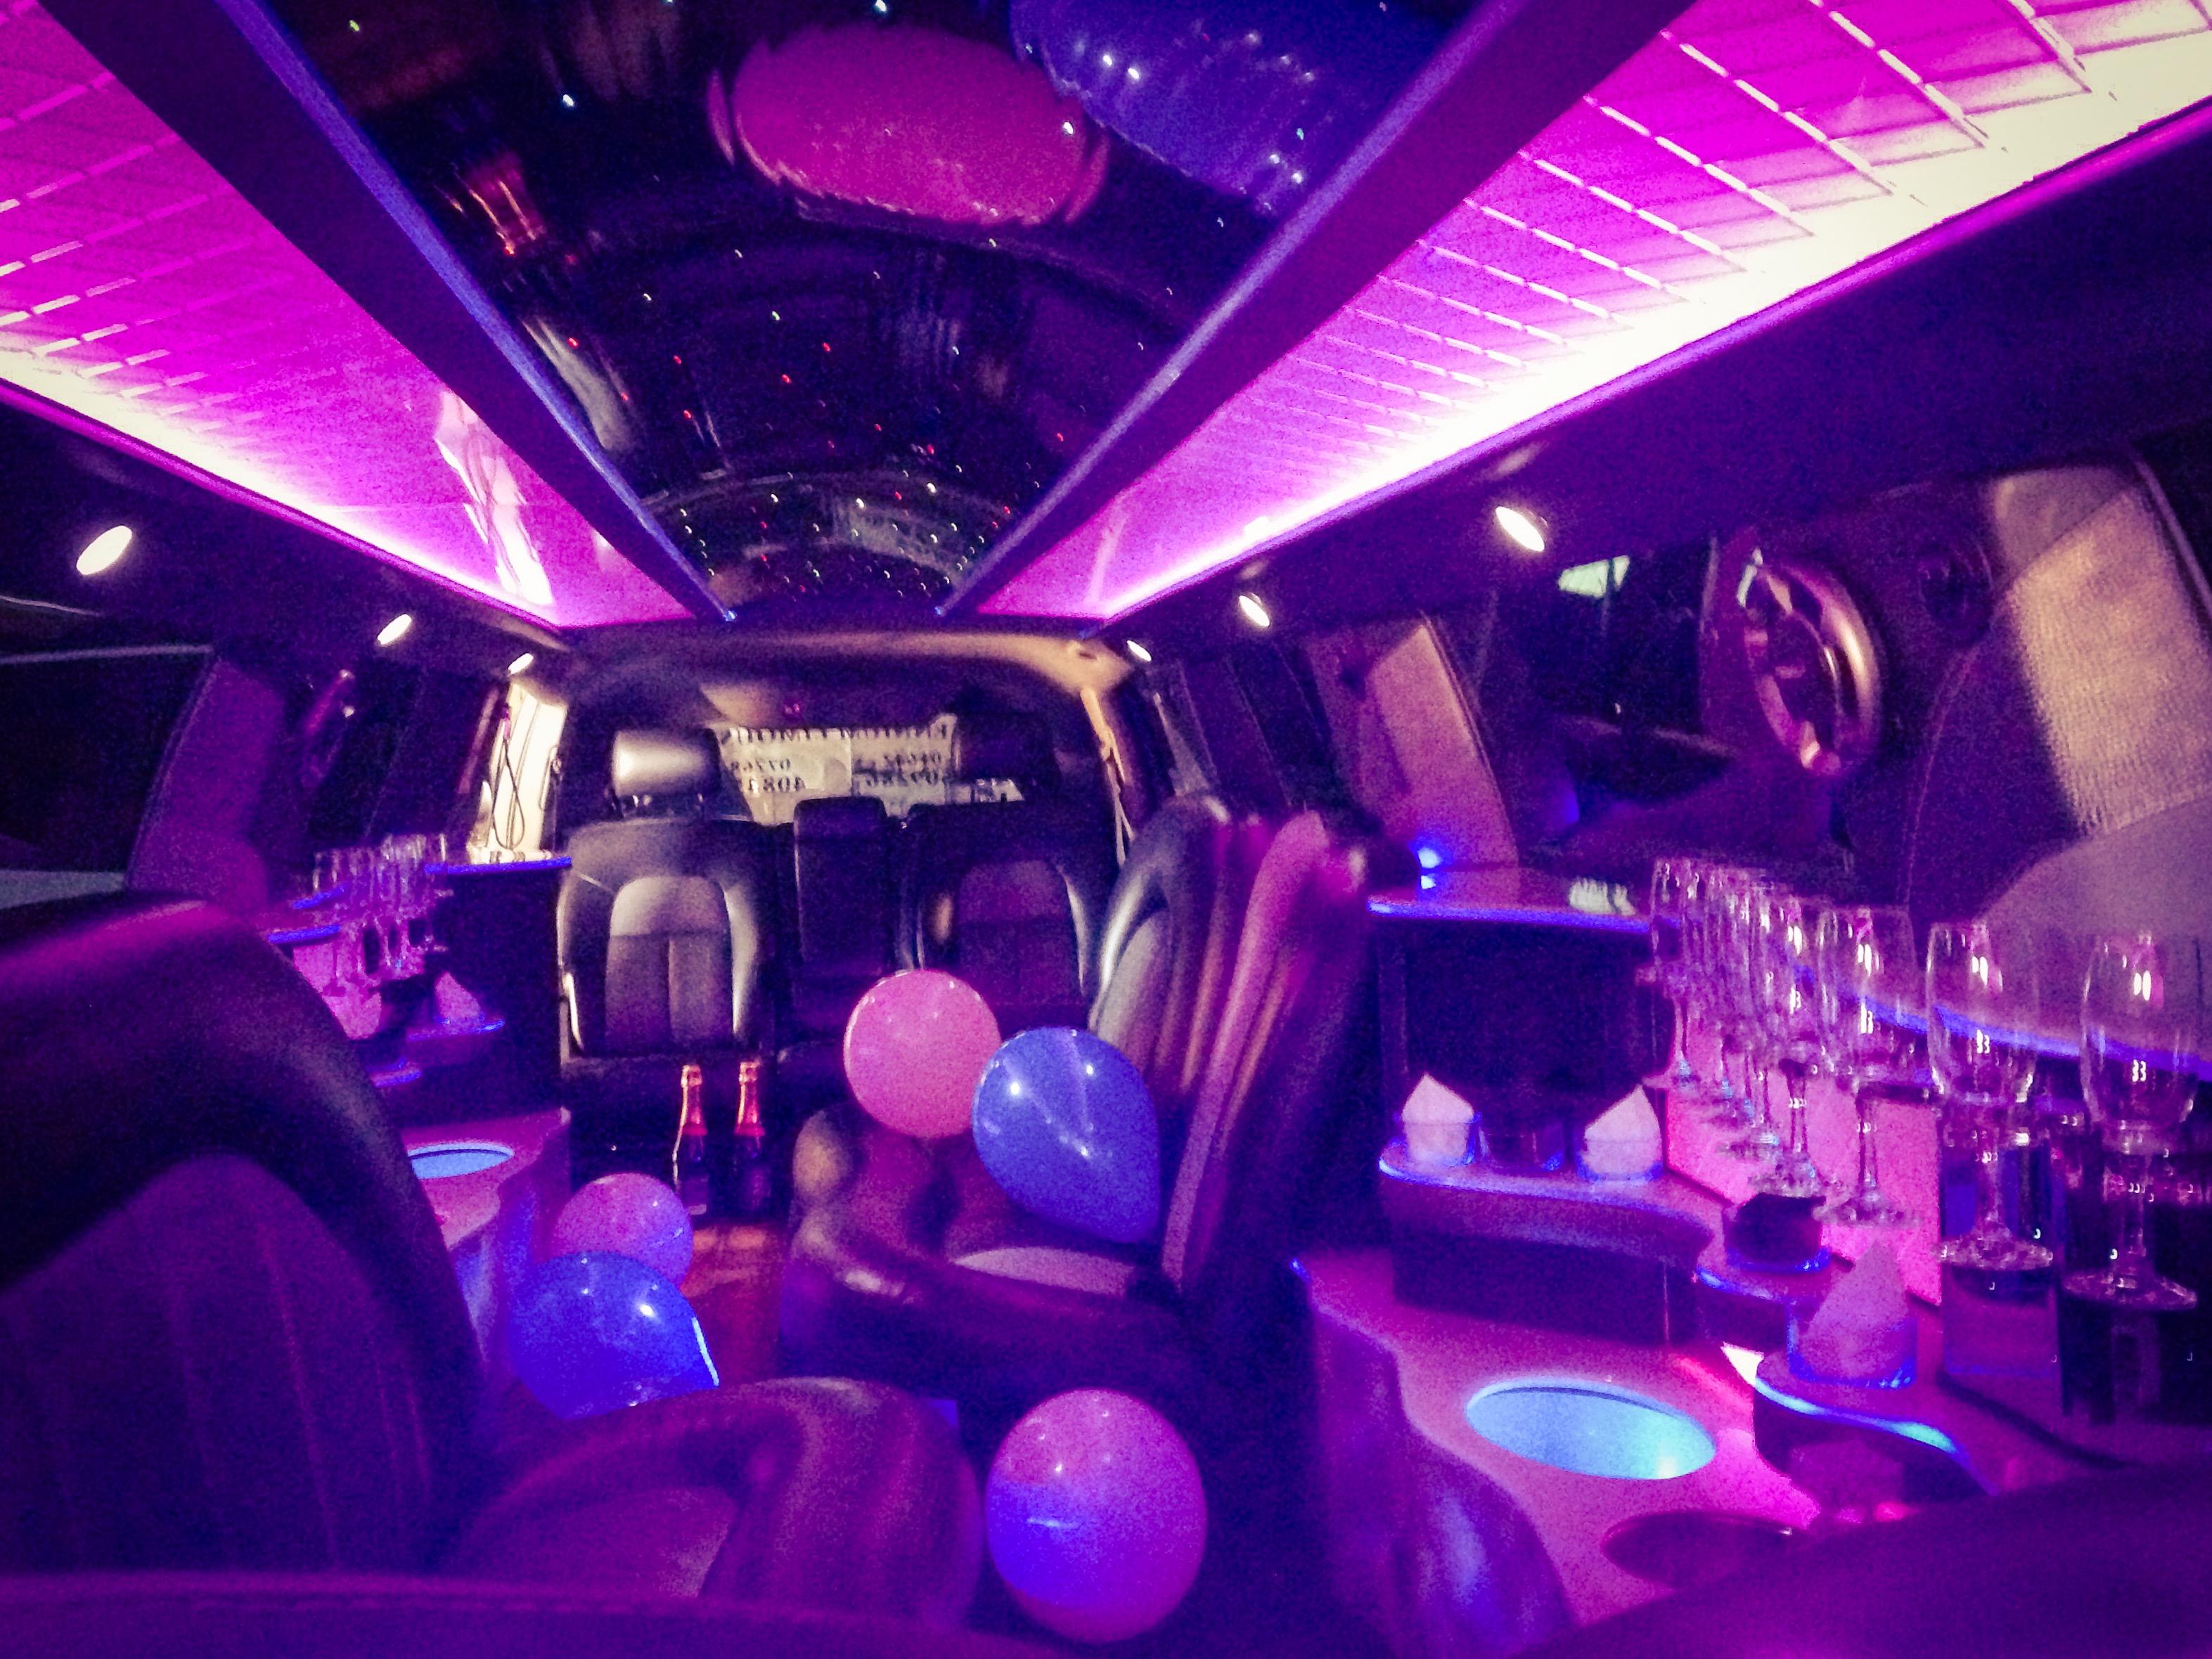 Limousine interior.